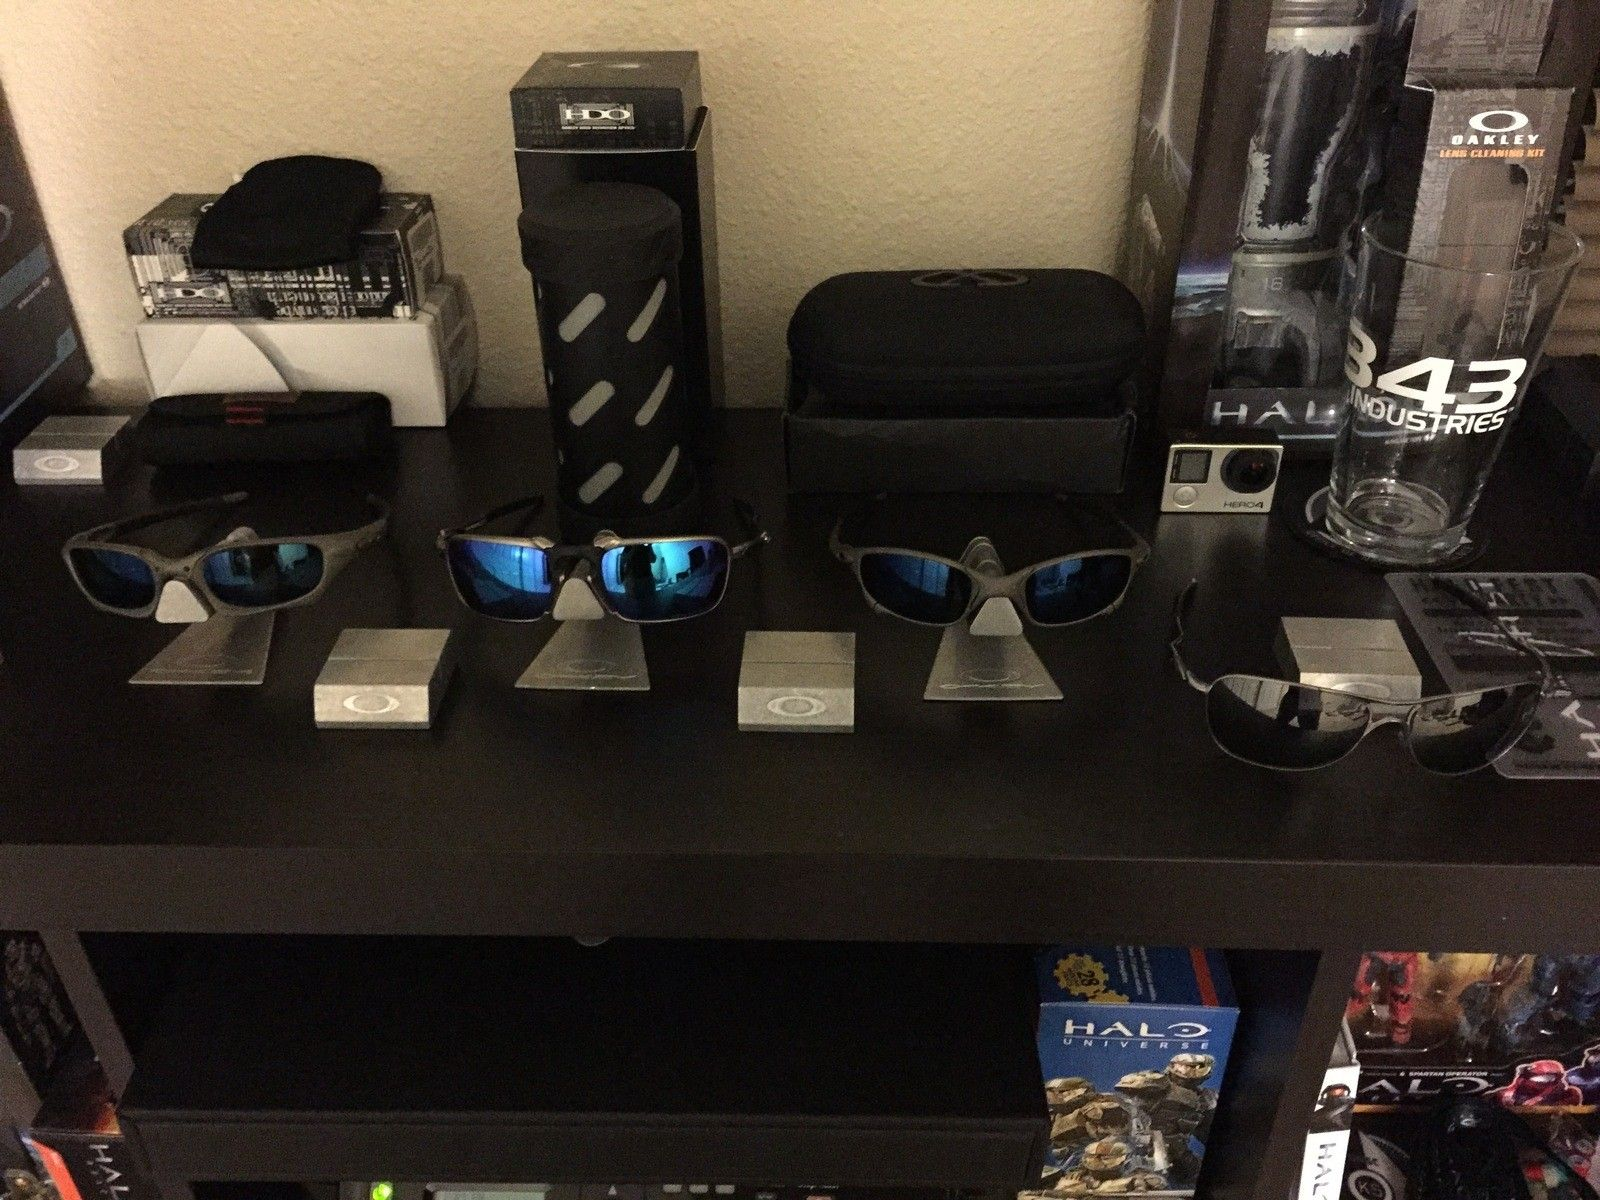 My Collection So Far - 2.JPG